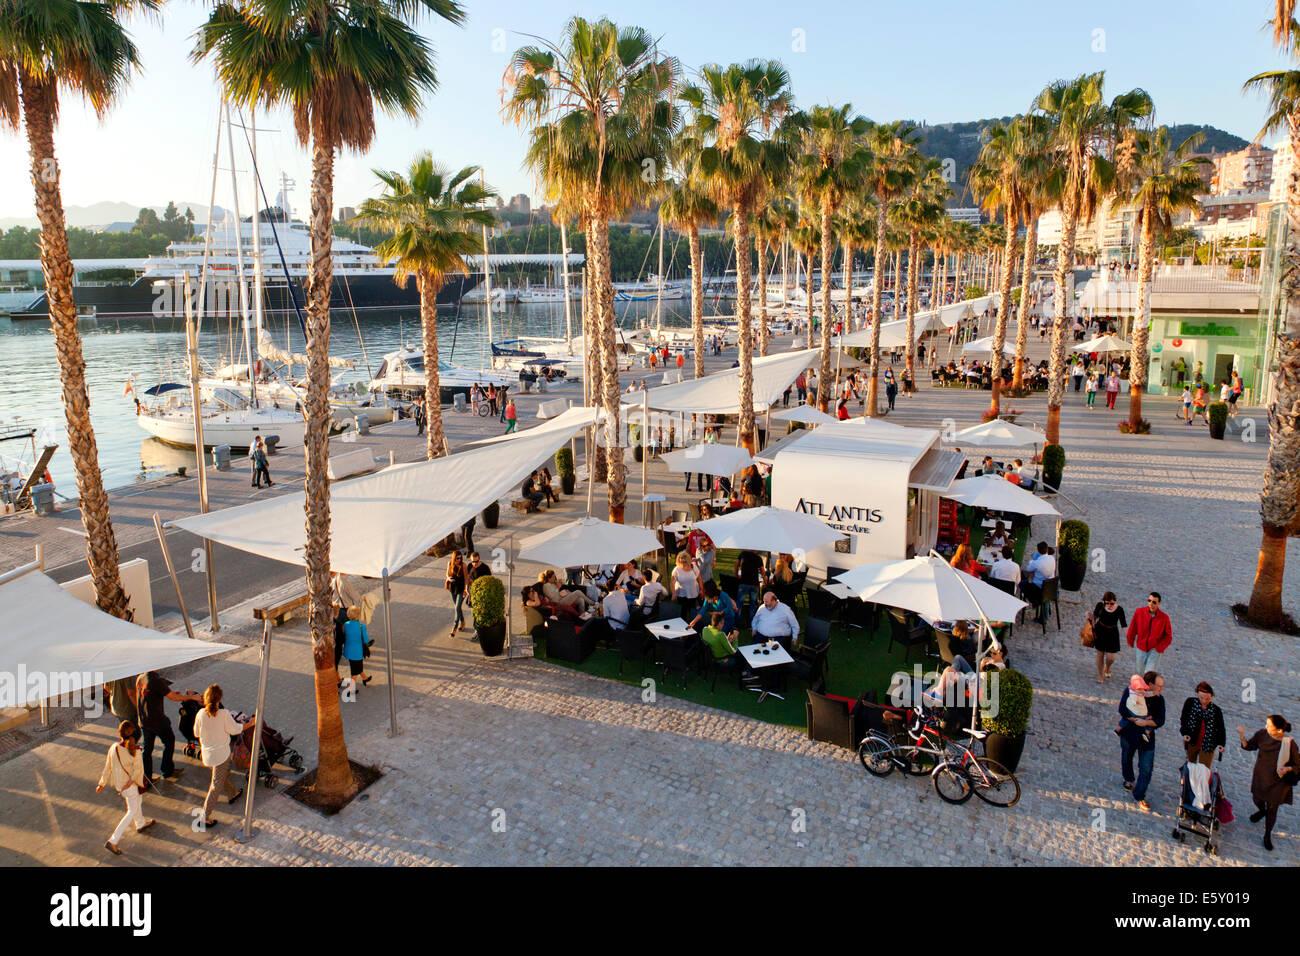 Spain cafe promenade stock photos spain cafe promenade - Stock uno alicante ...